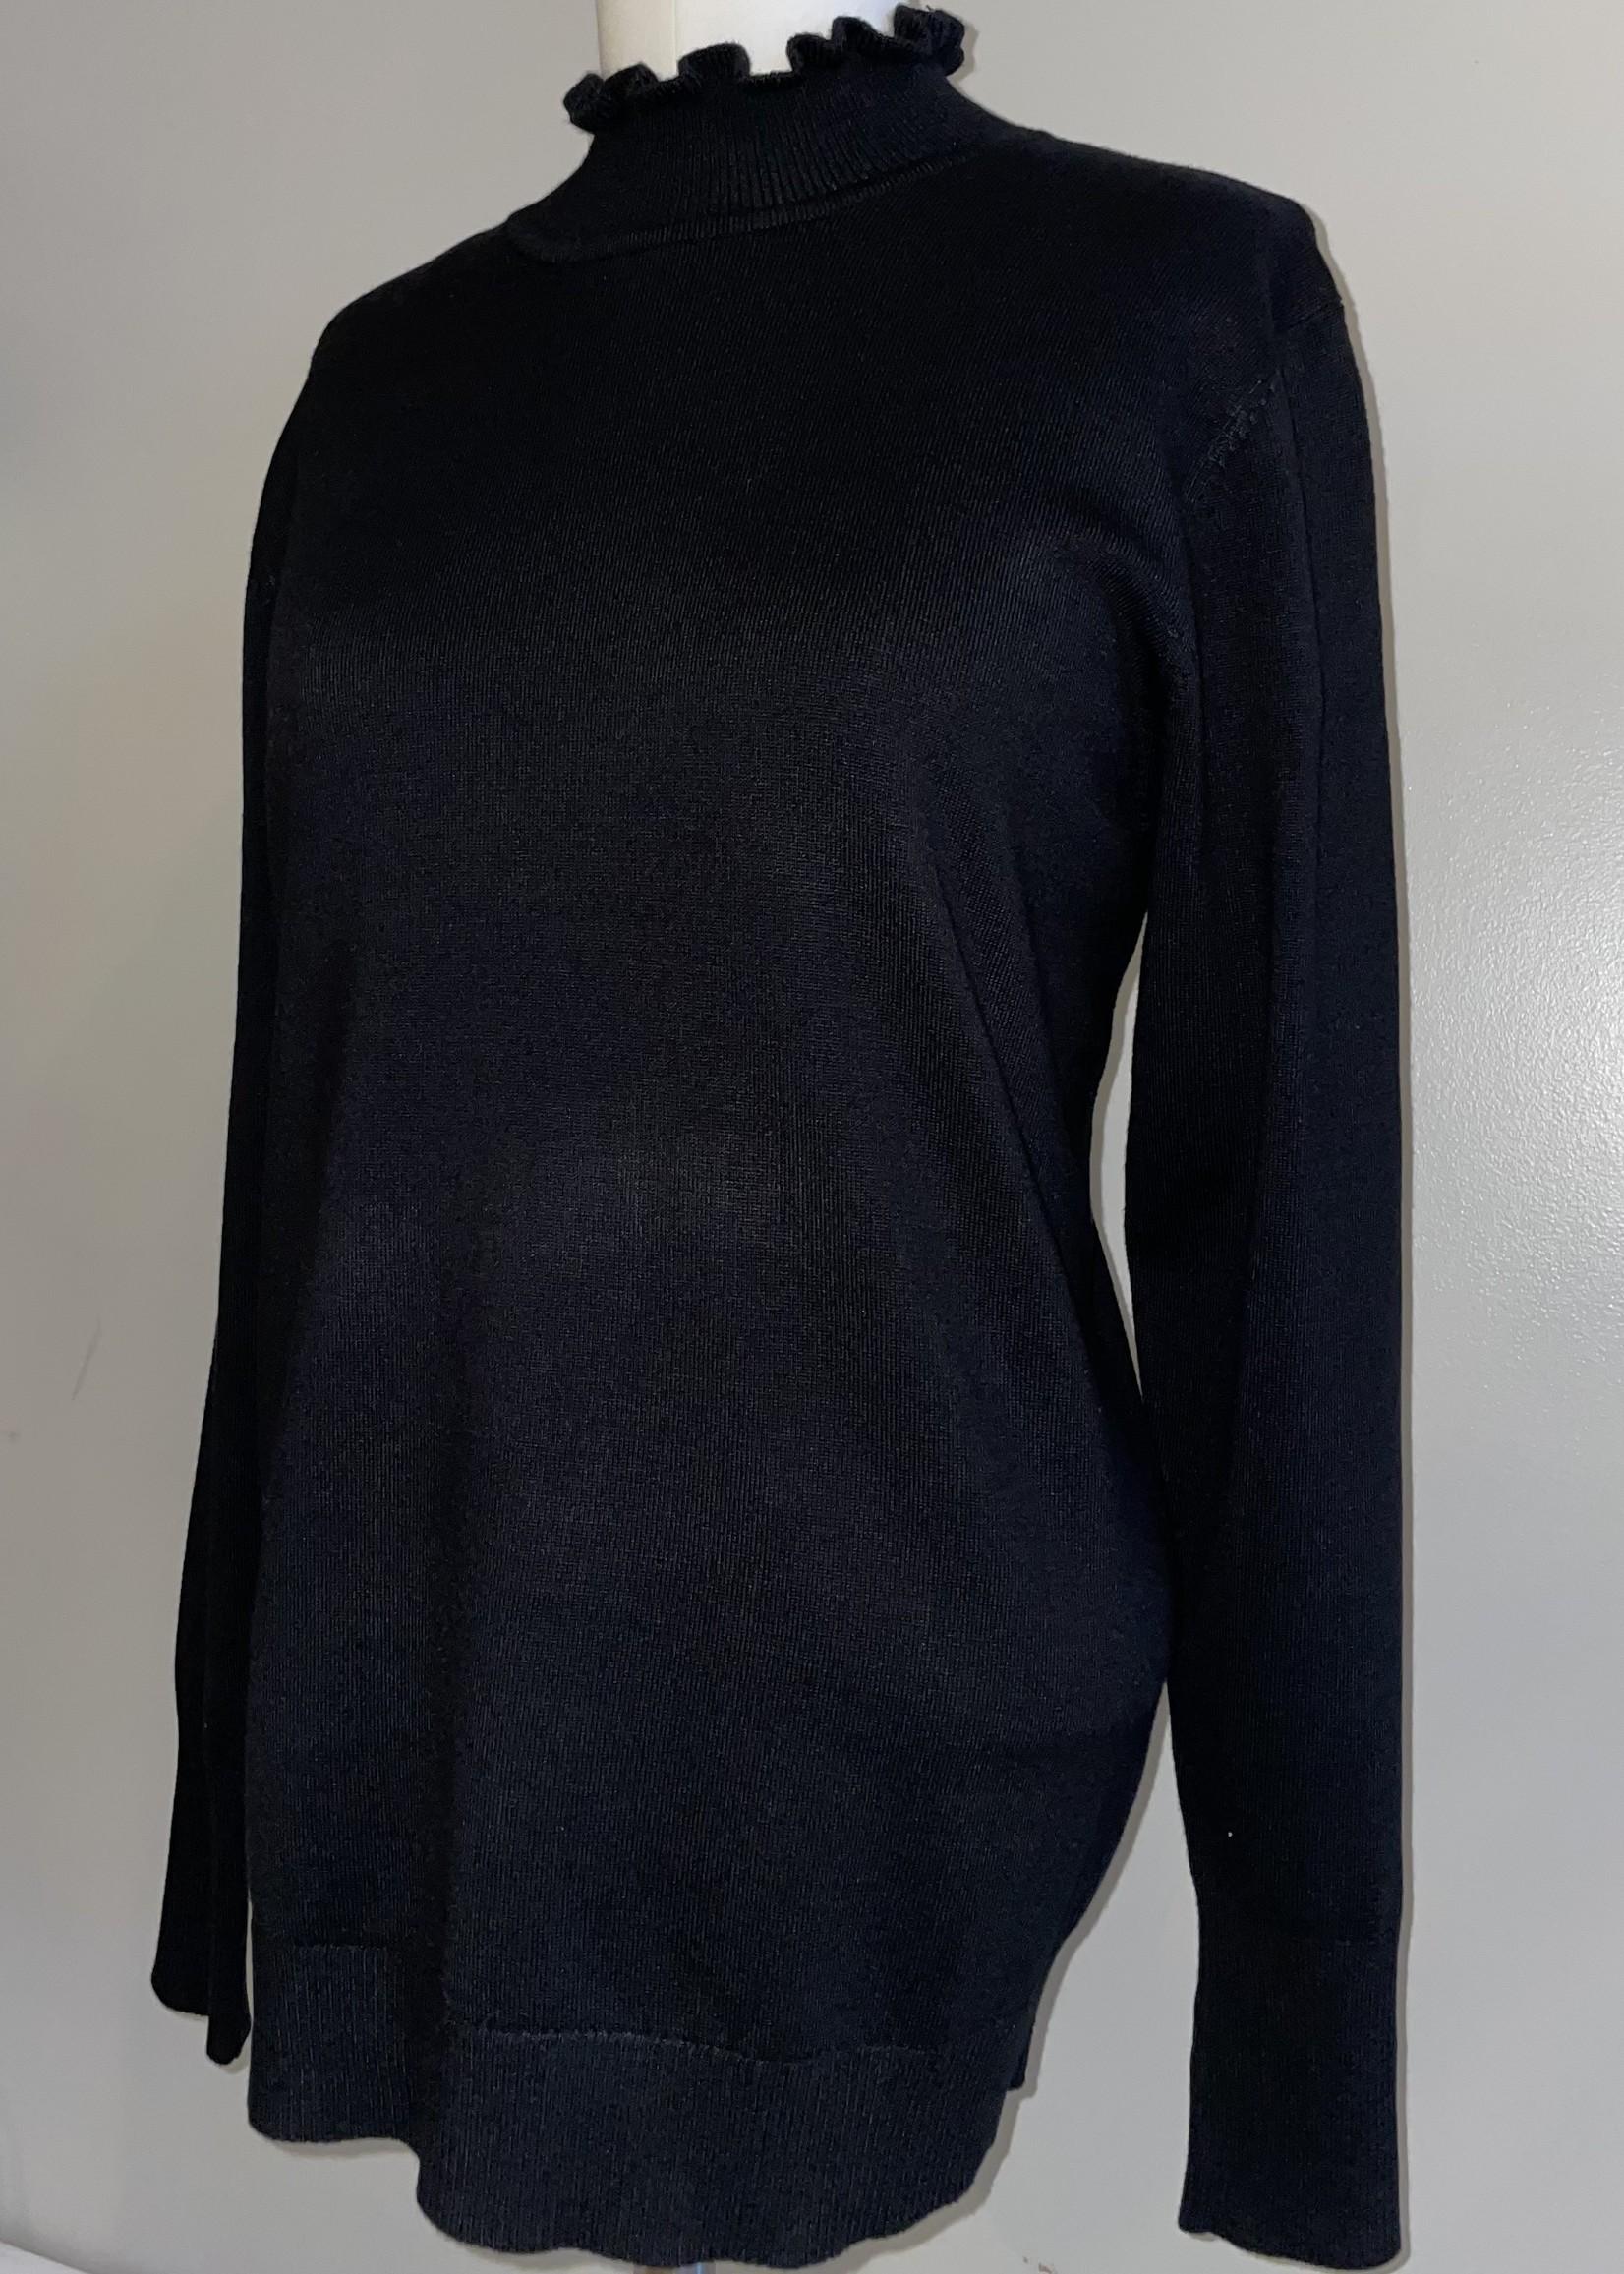 Sunday Black Frill-Neck Sweater